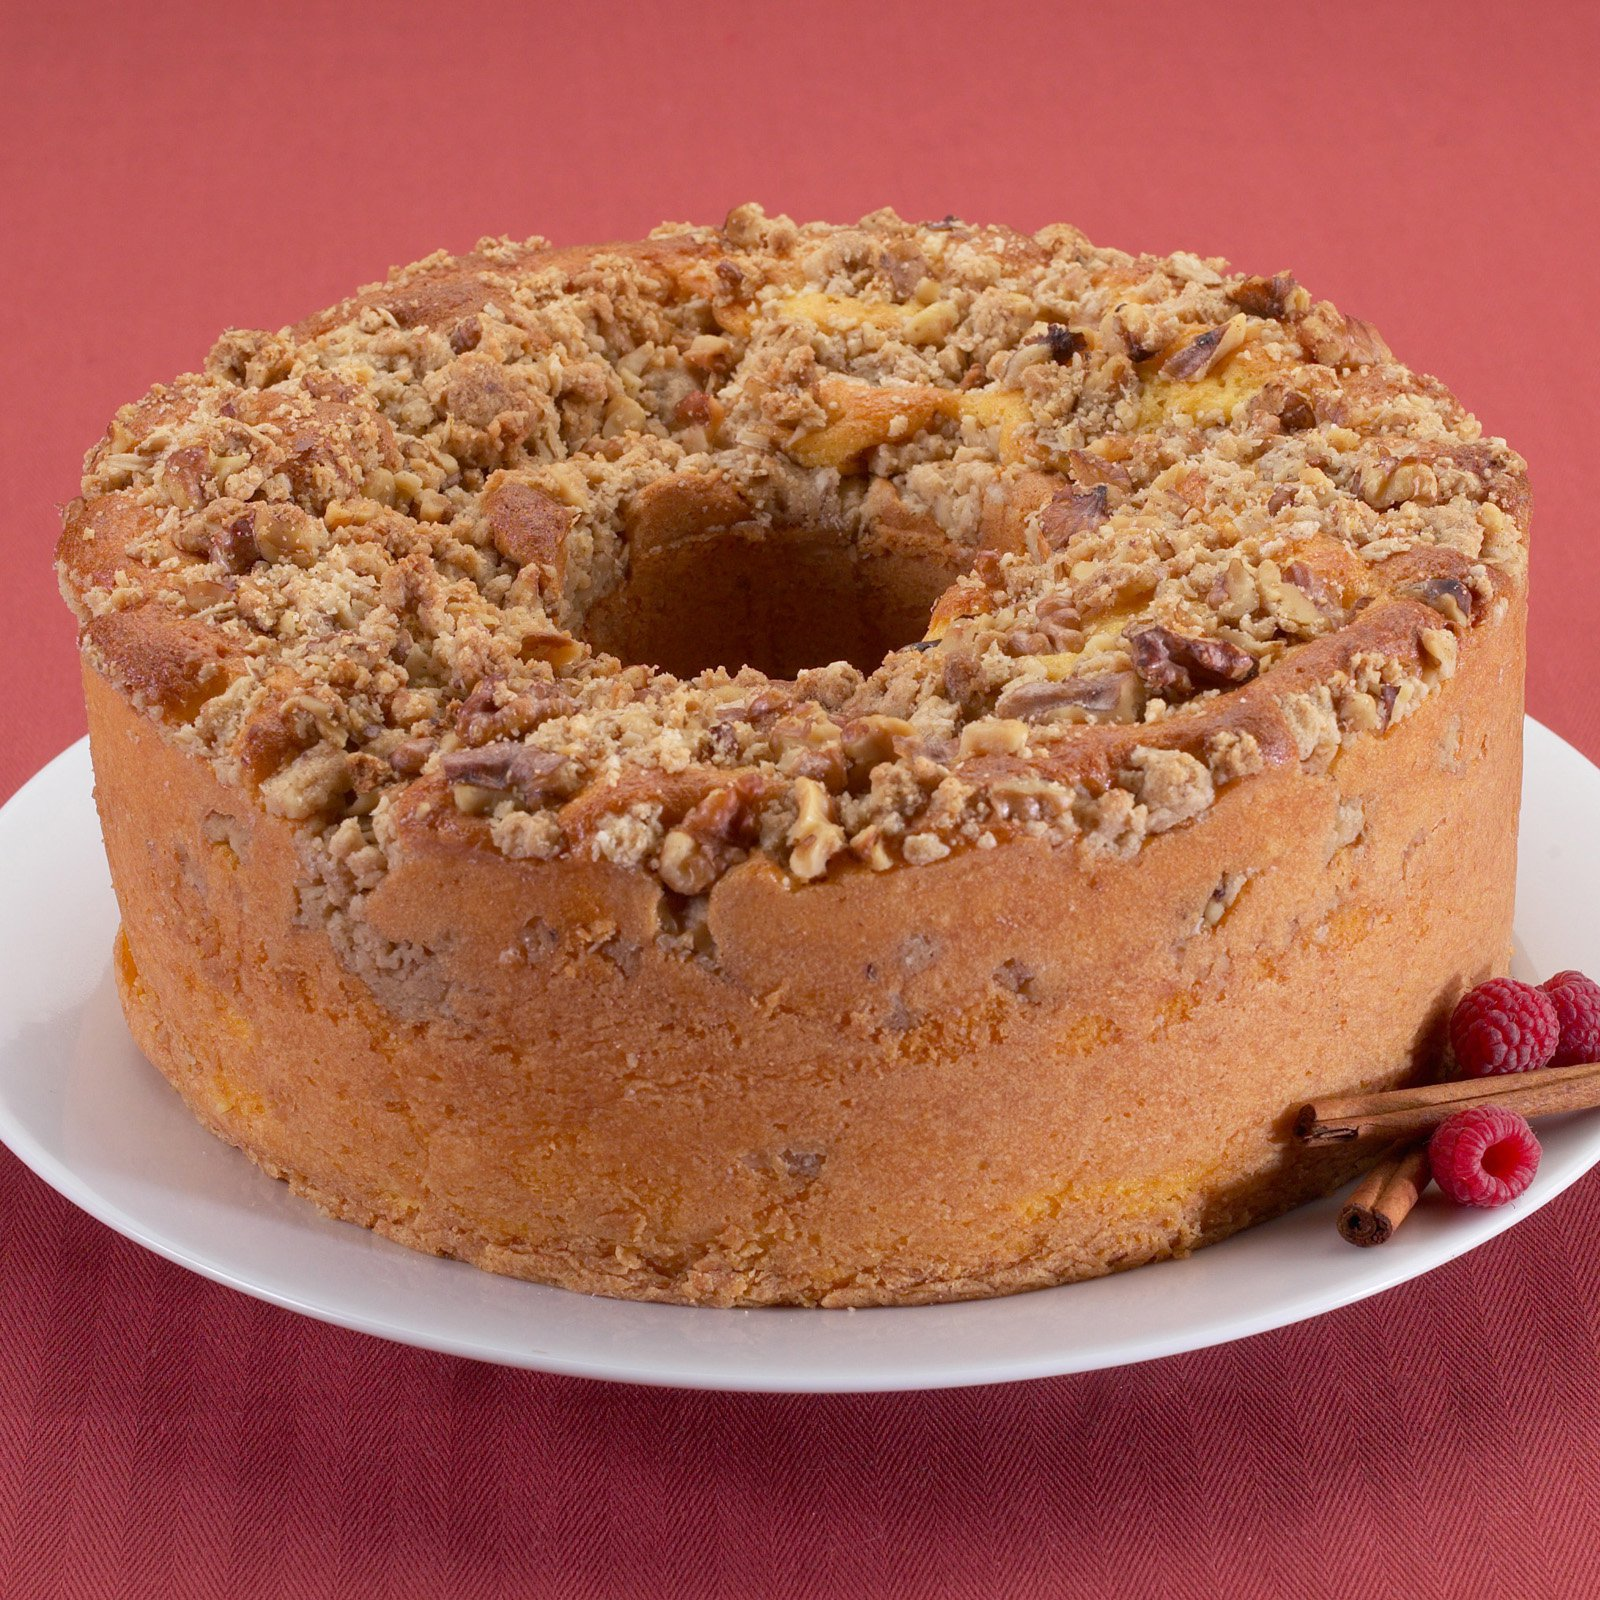 Nordic Ware Pro Form Bakeware Nonstick Metal Coffee Cake Pan